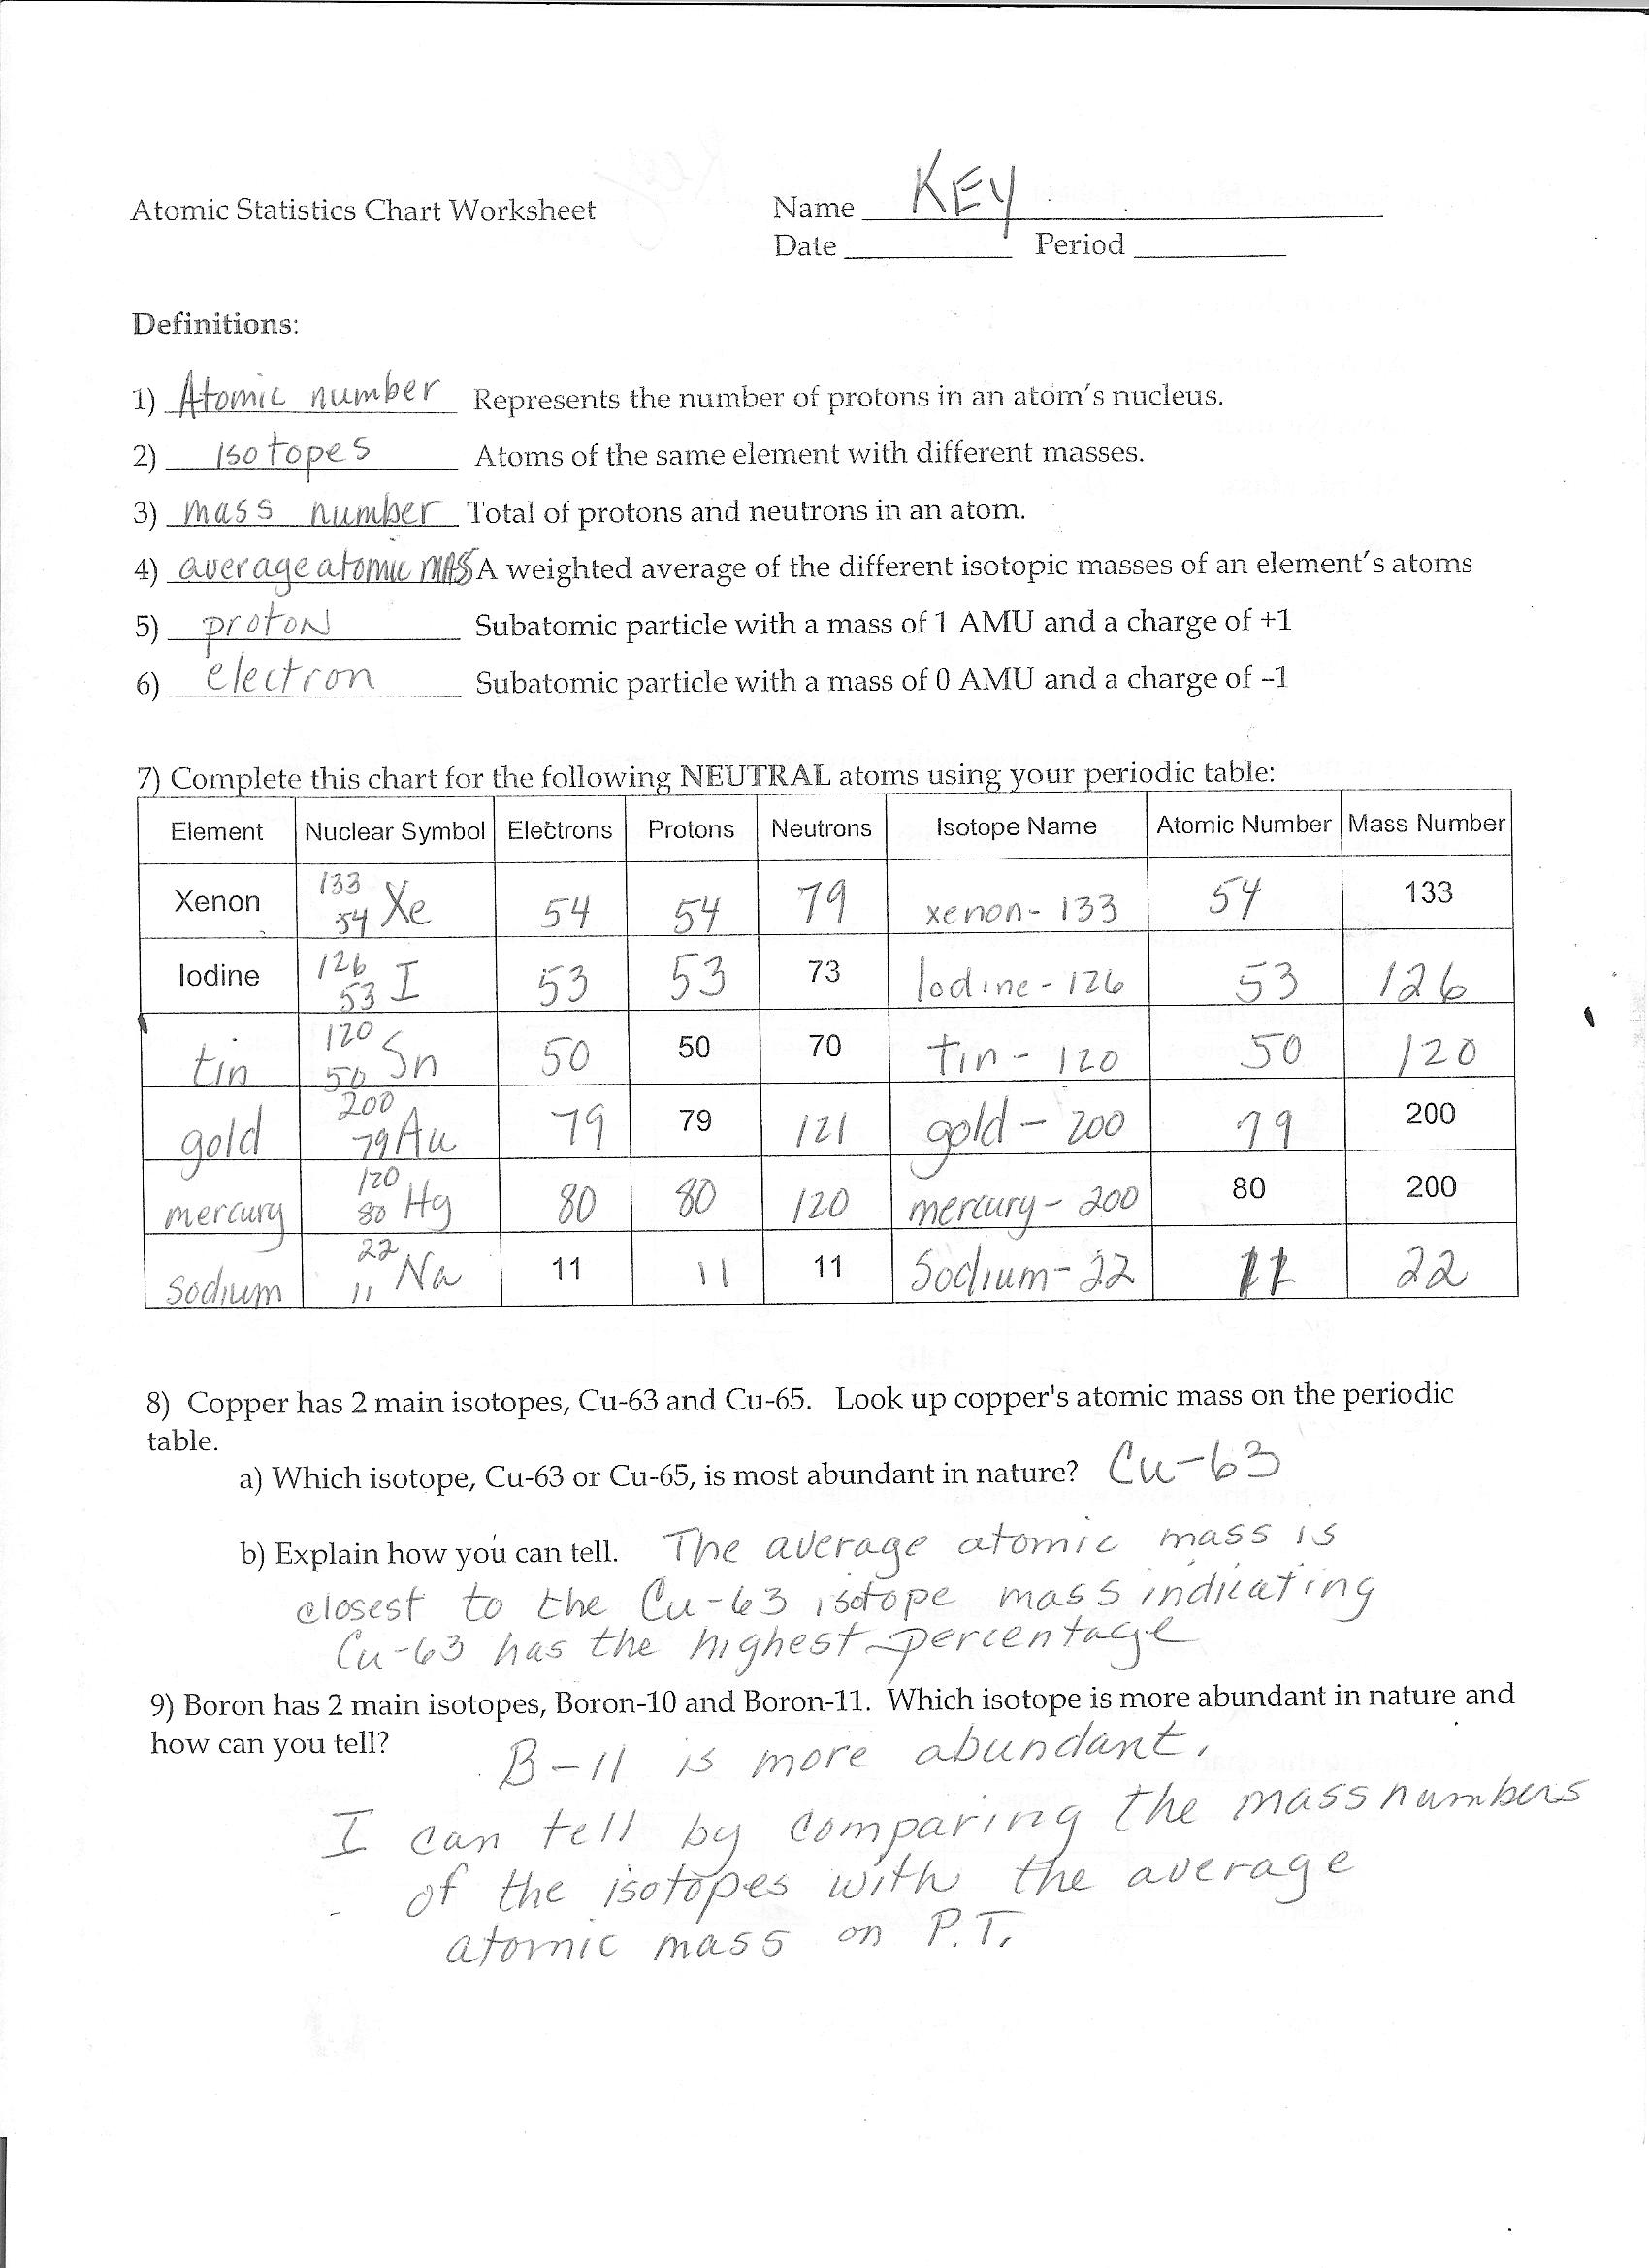 Atomic Structure Practice Worksheet 1 2293041